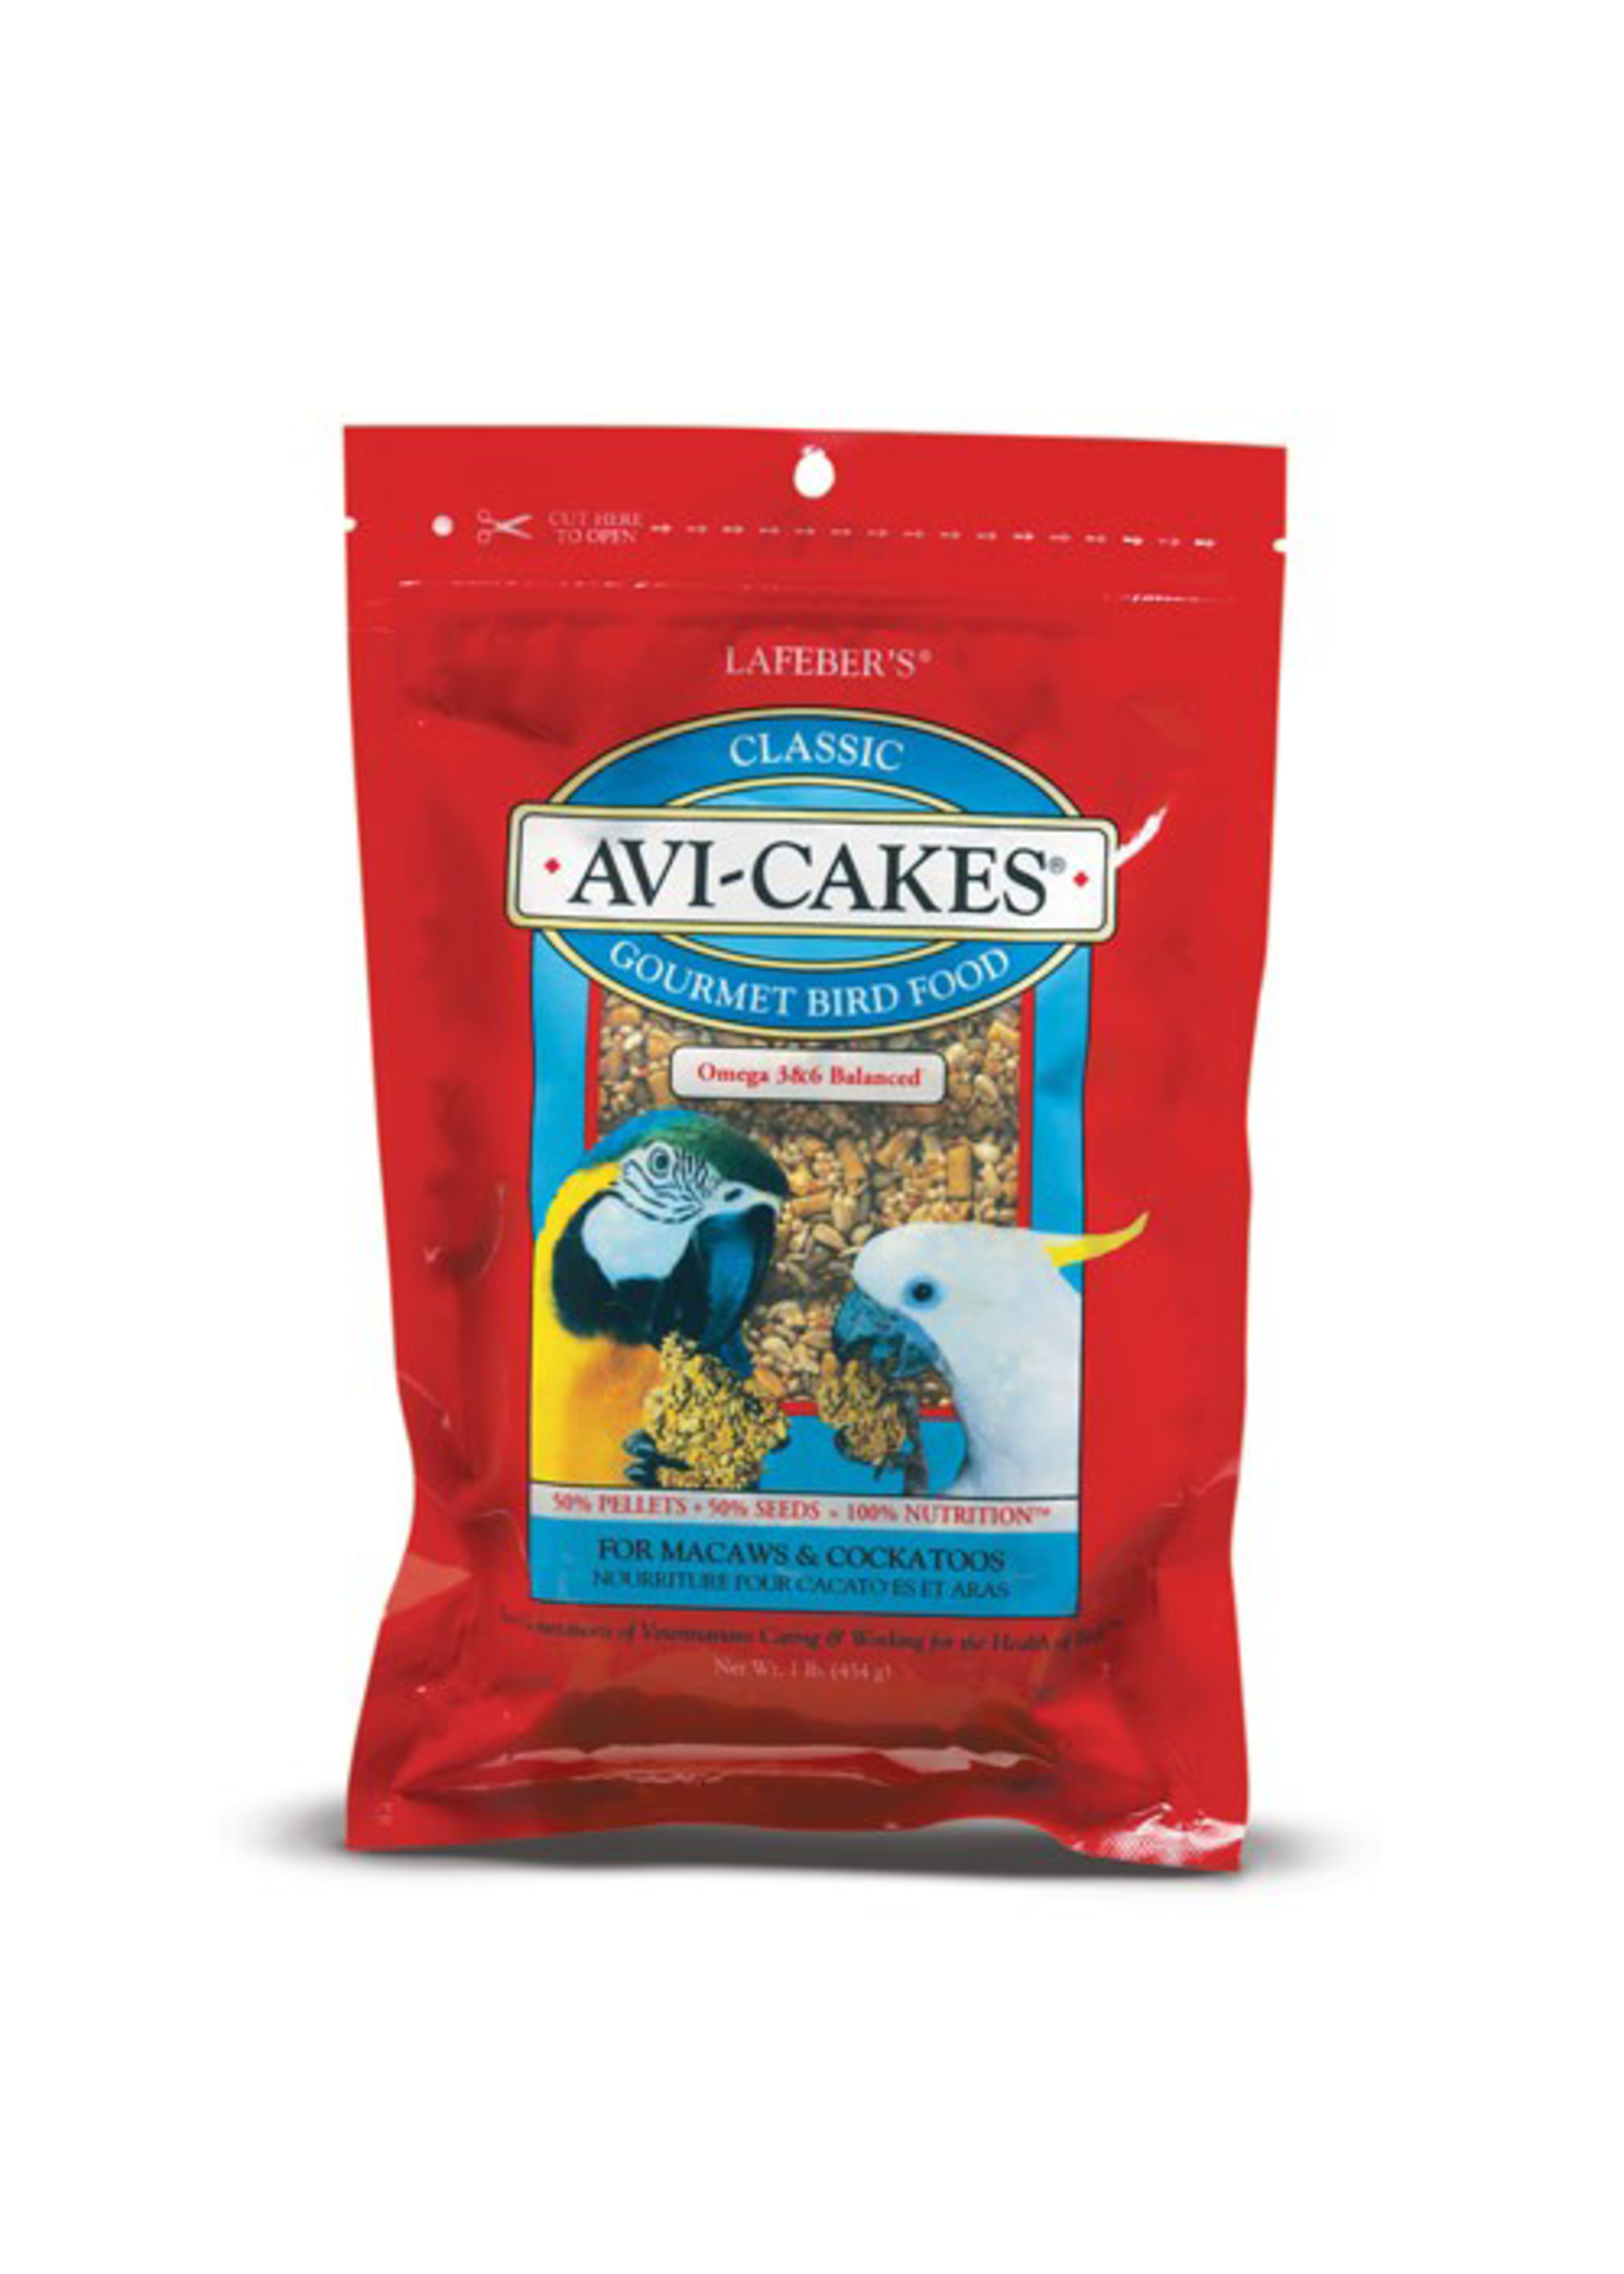 Lafeber's Lafeber Avi-Cakes Classic for Macaws, Cockatoos (1lb)